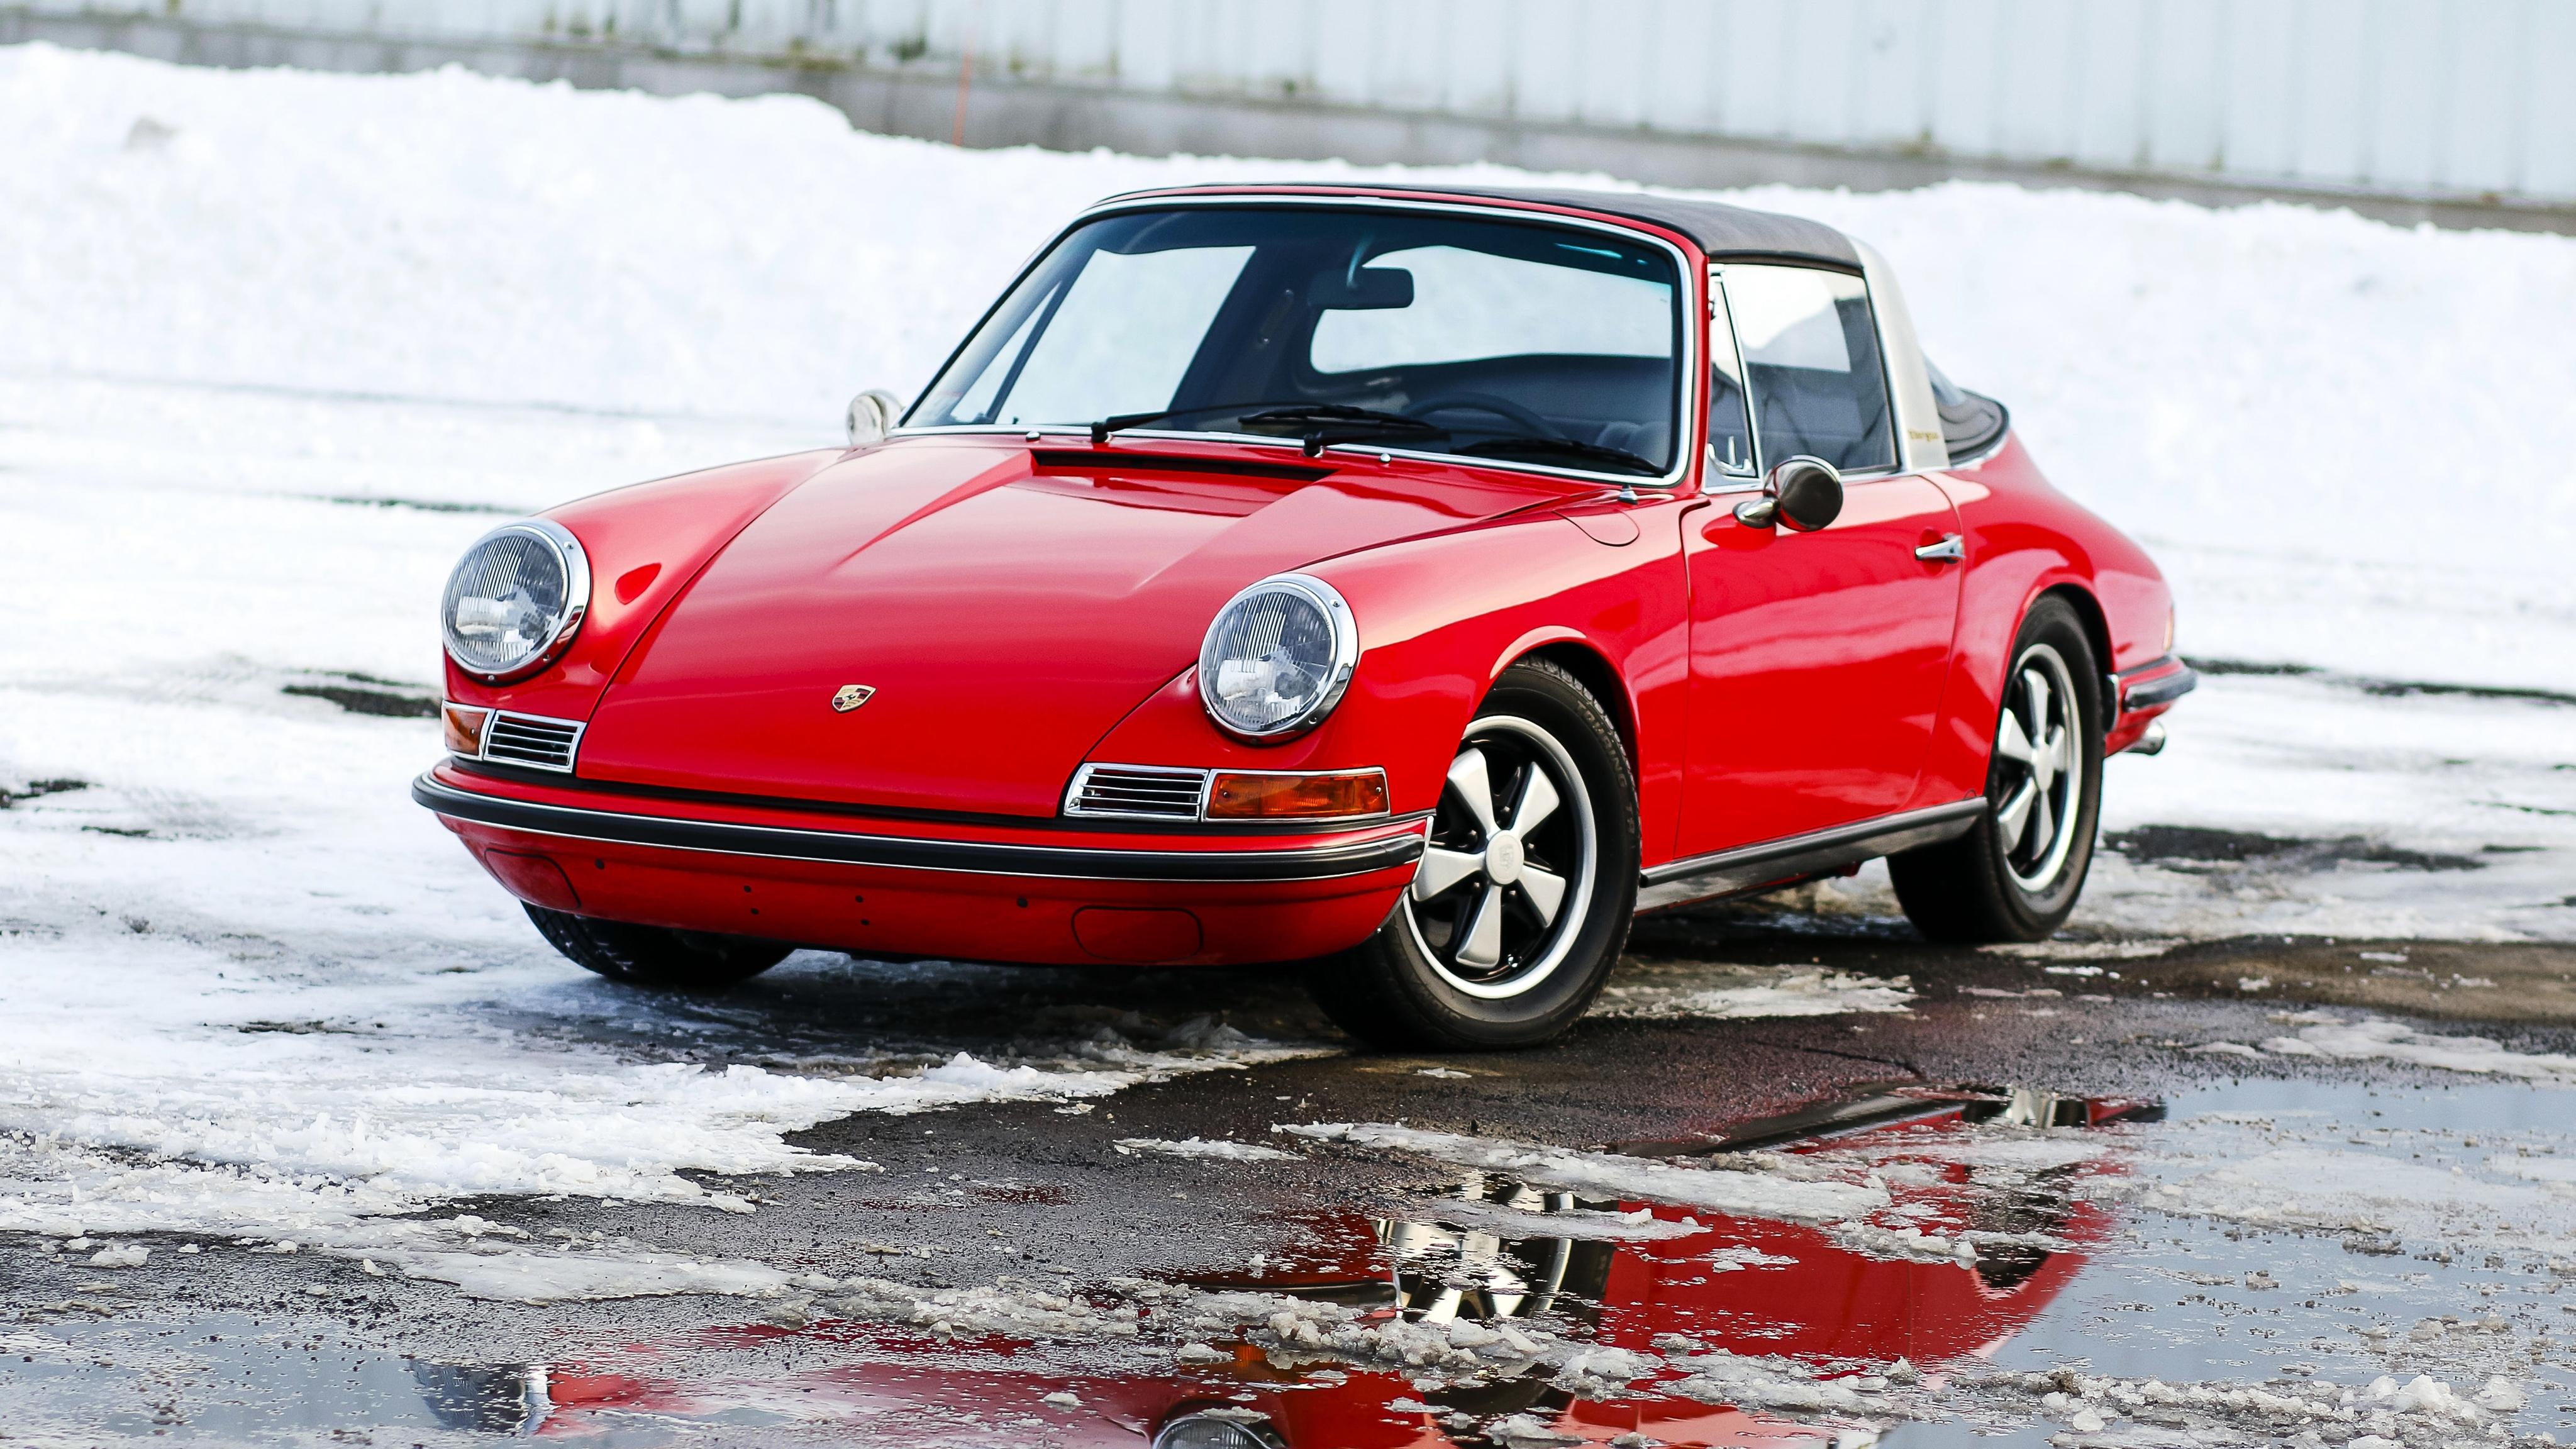 Porsche 911 Targa Wallpapers Pictures Images 4096x2304